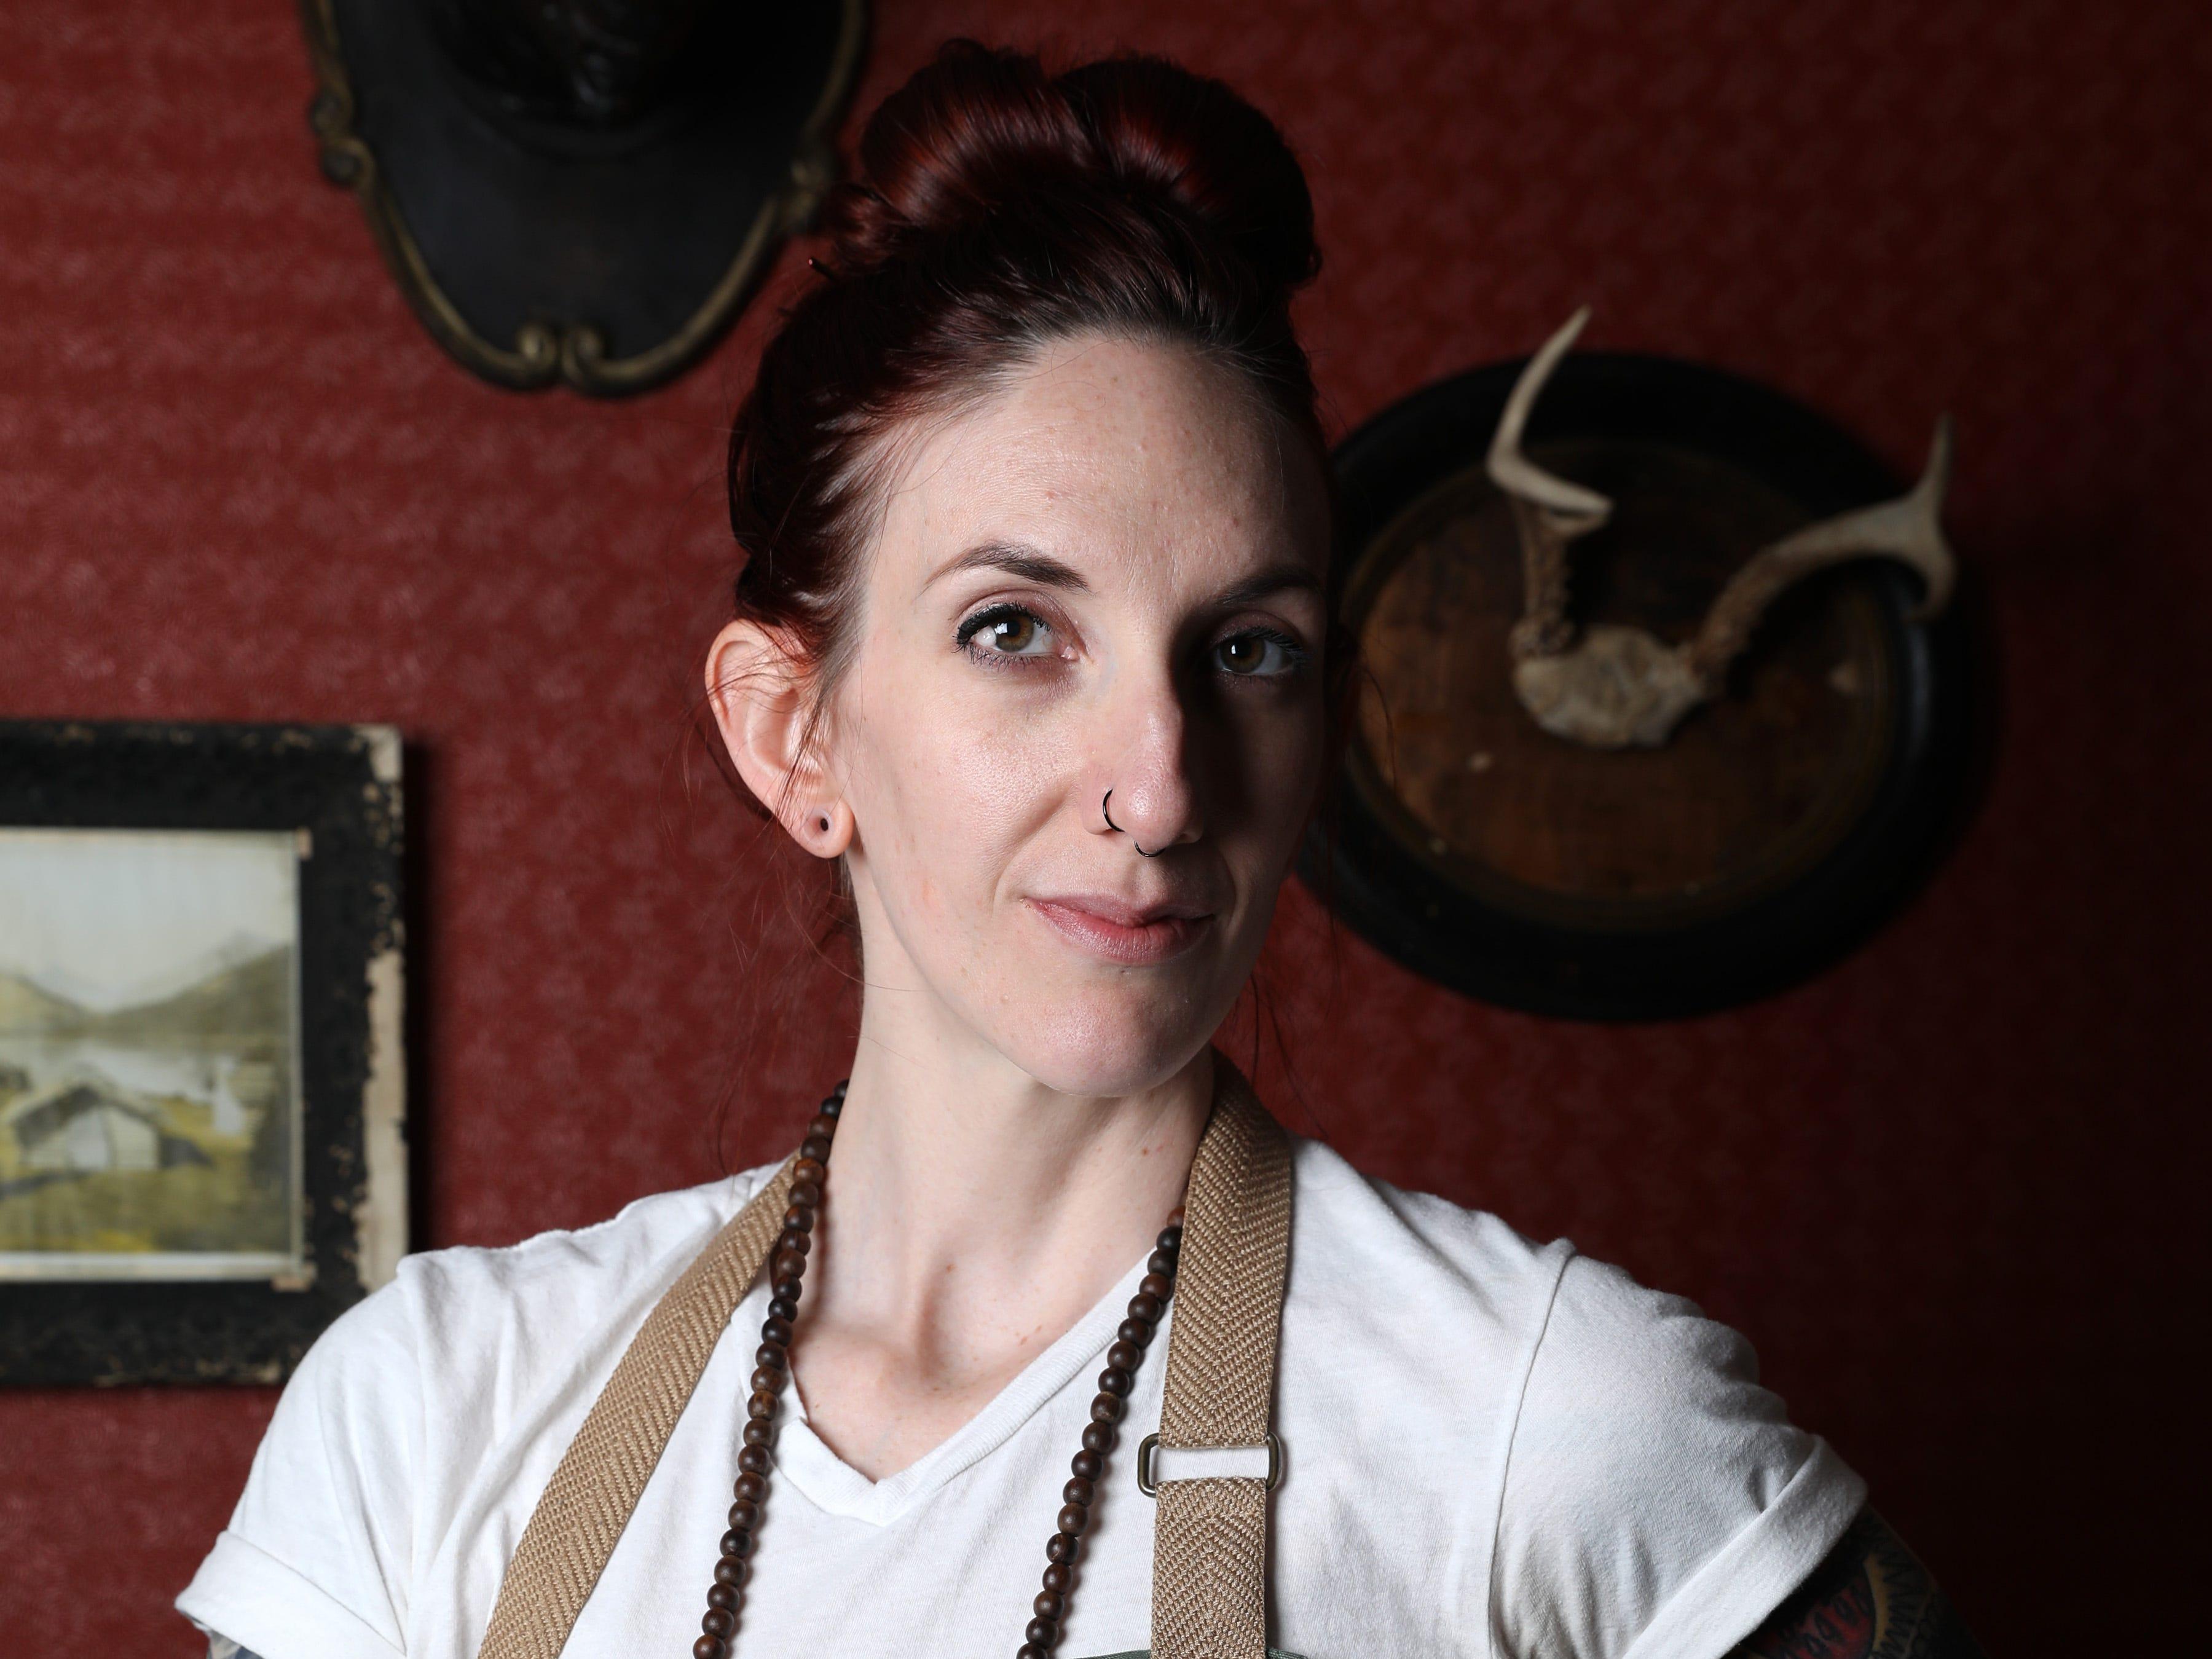 Chef Sajin Renae Perino, the chef de cuisine at The Cookery in Dobbs Ferry March 21, 2019.